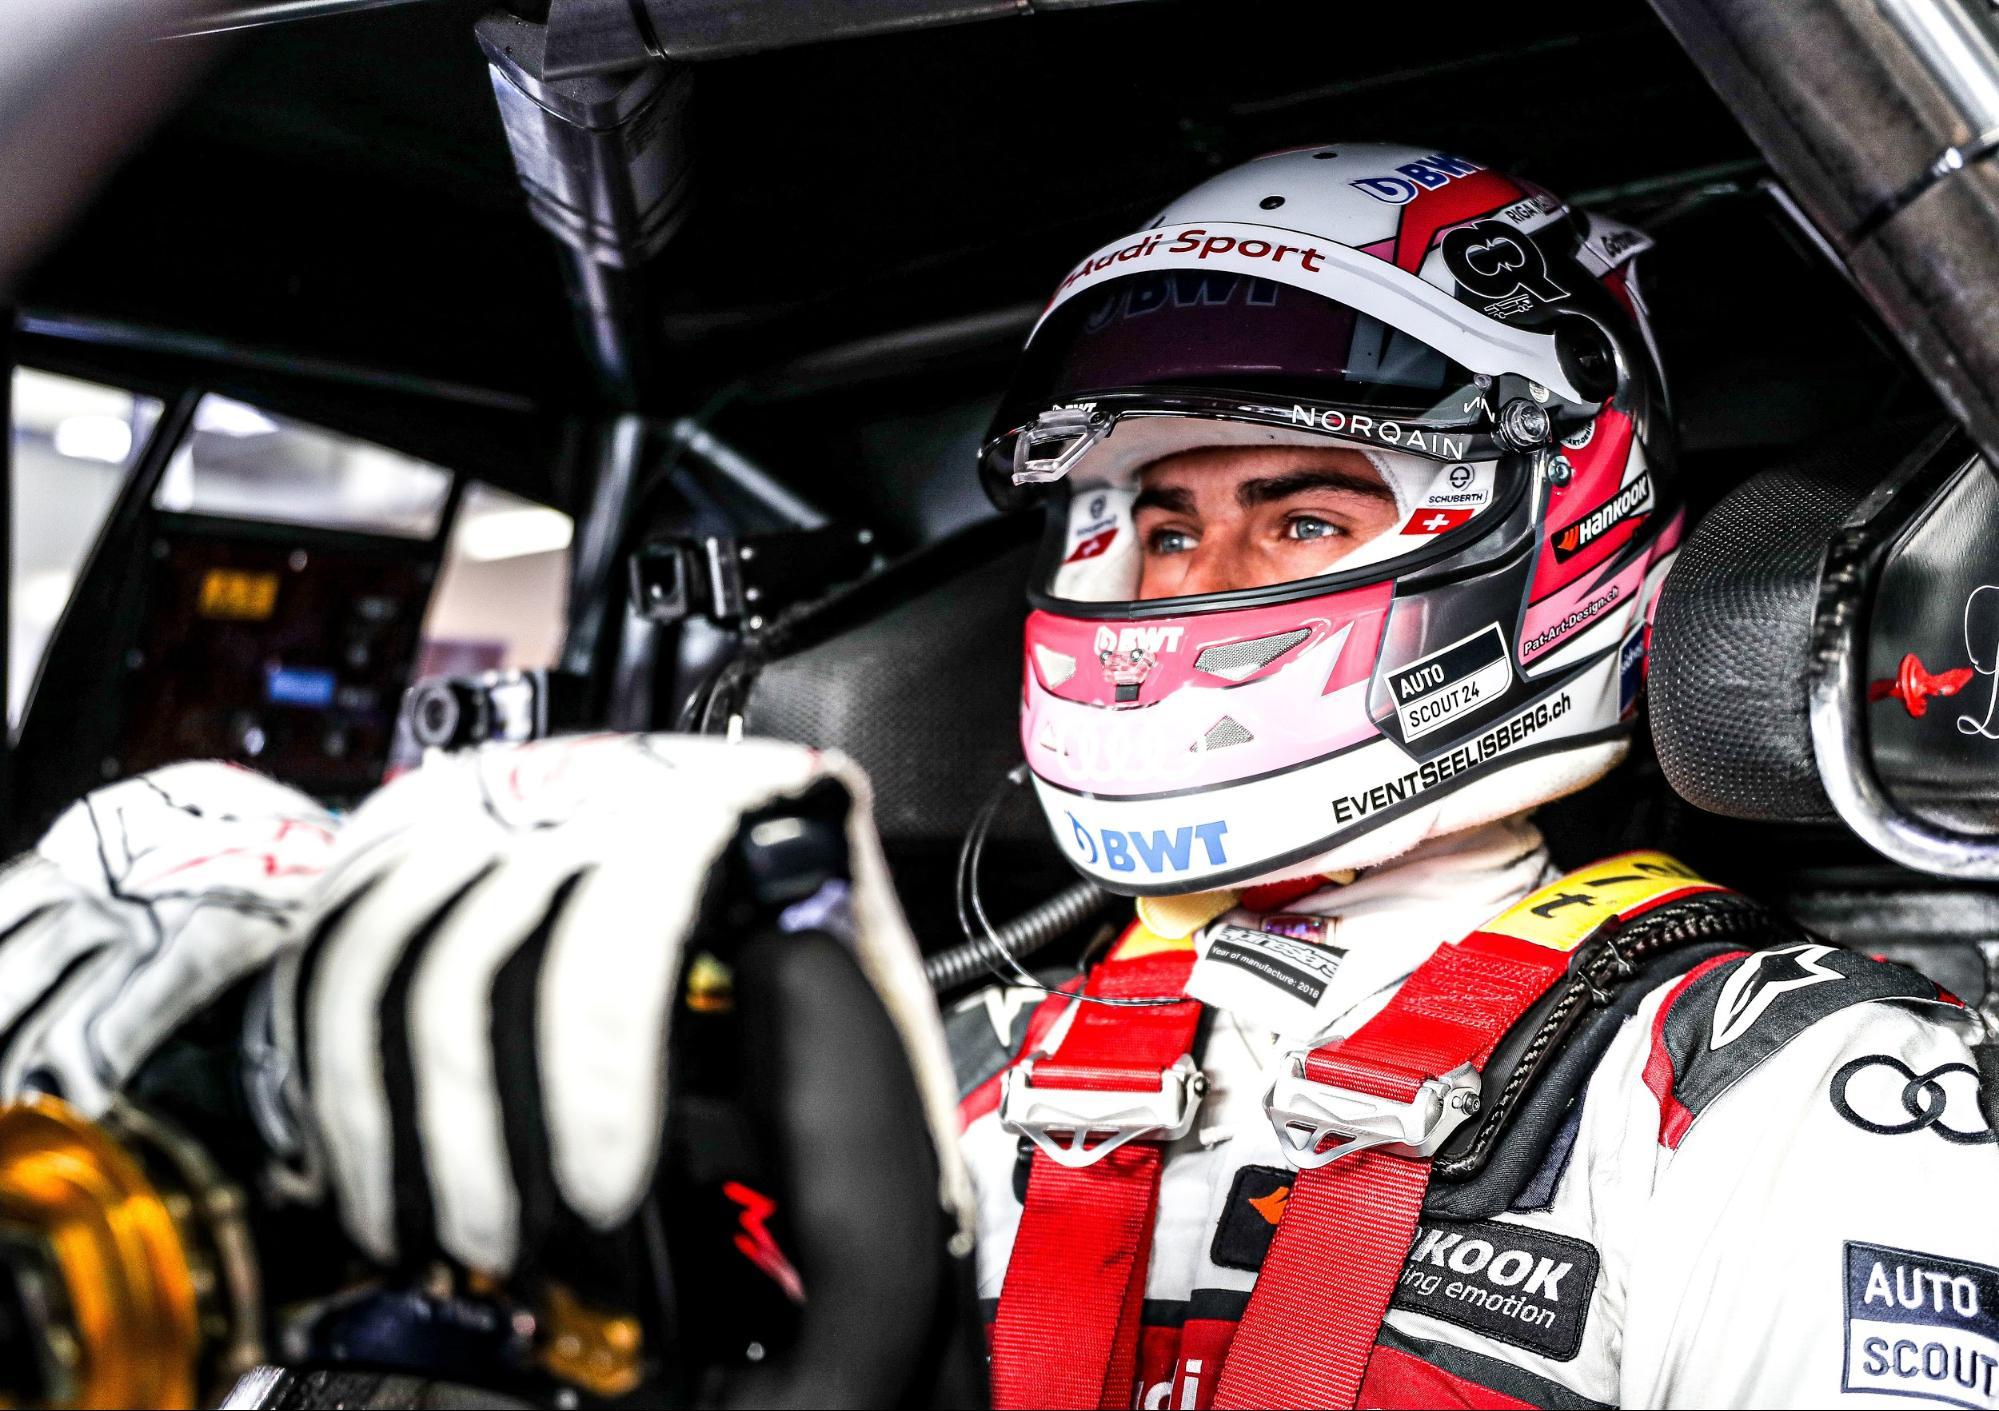 Nico Müller nel cockpit della sua Audi RS 5 DTM. (AUDI)